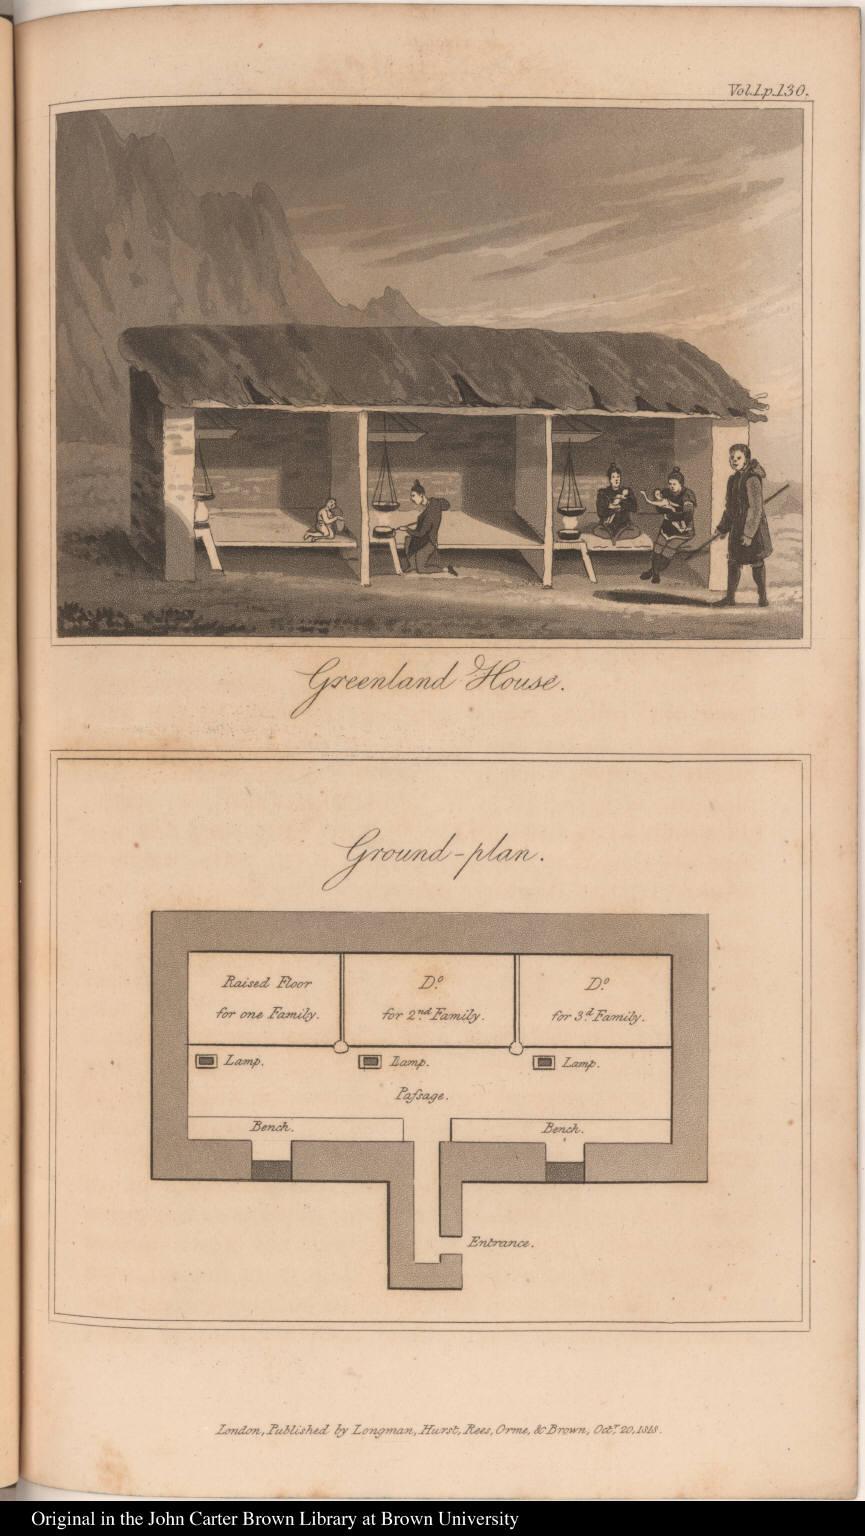 (top) Greenland House. (bottom) Ground-plan.